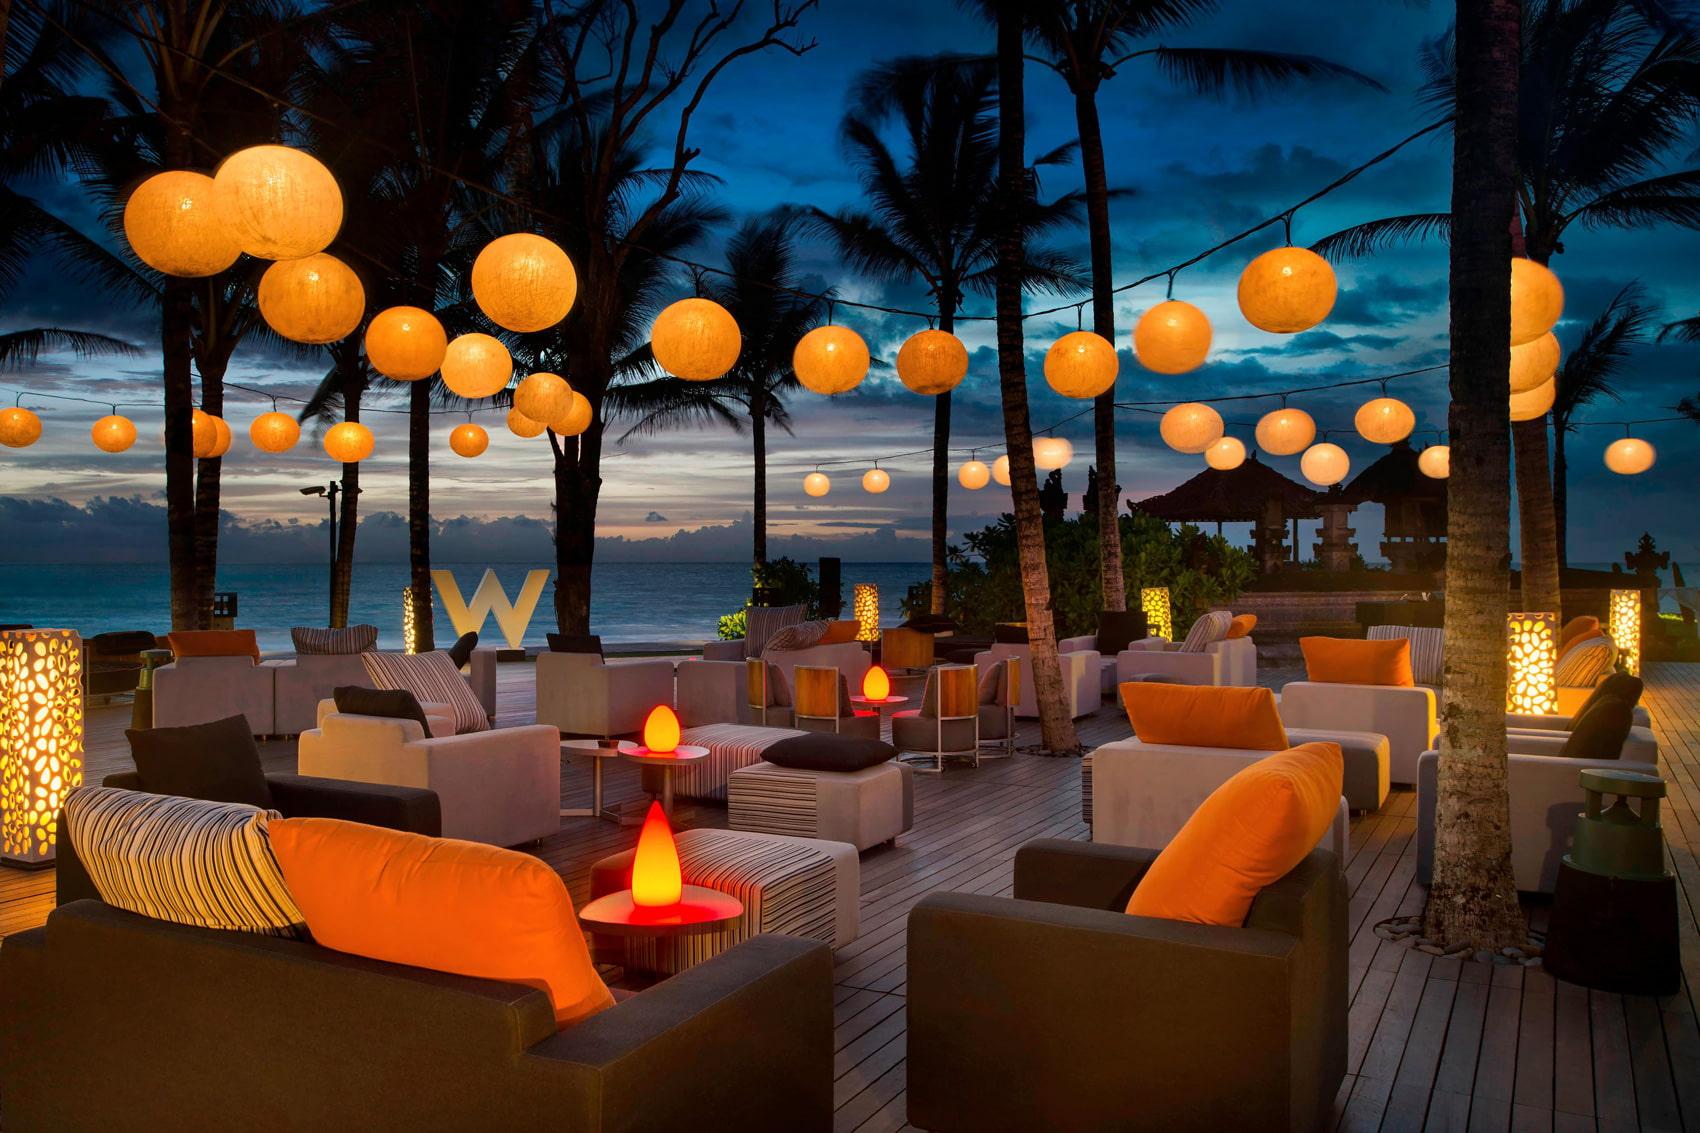 Beachfron hotel in Bali